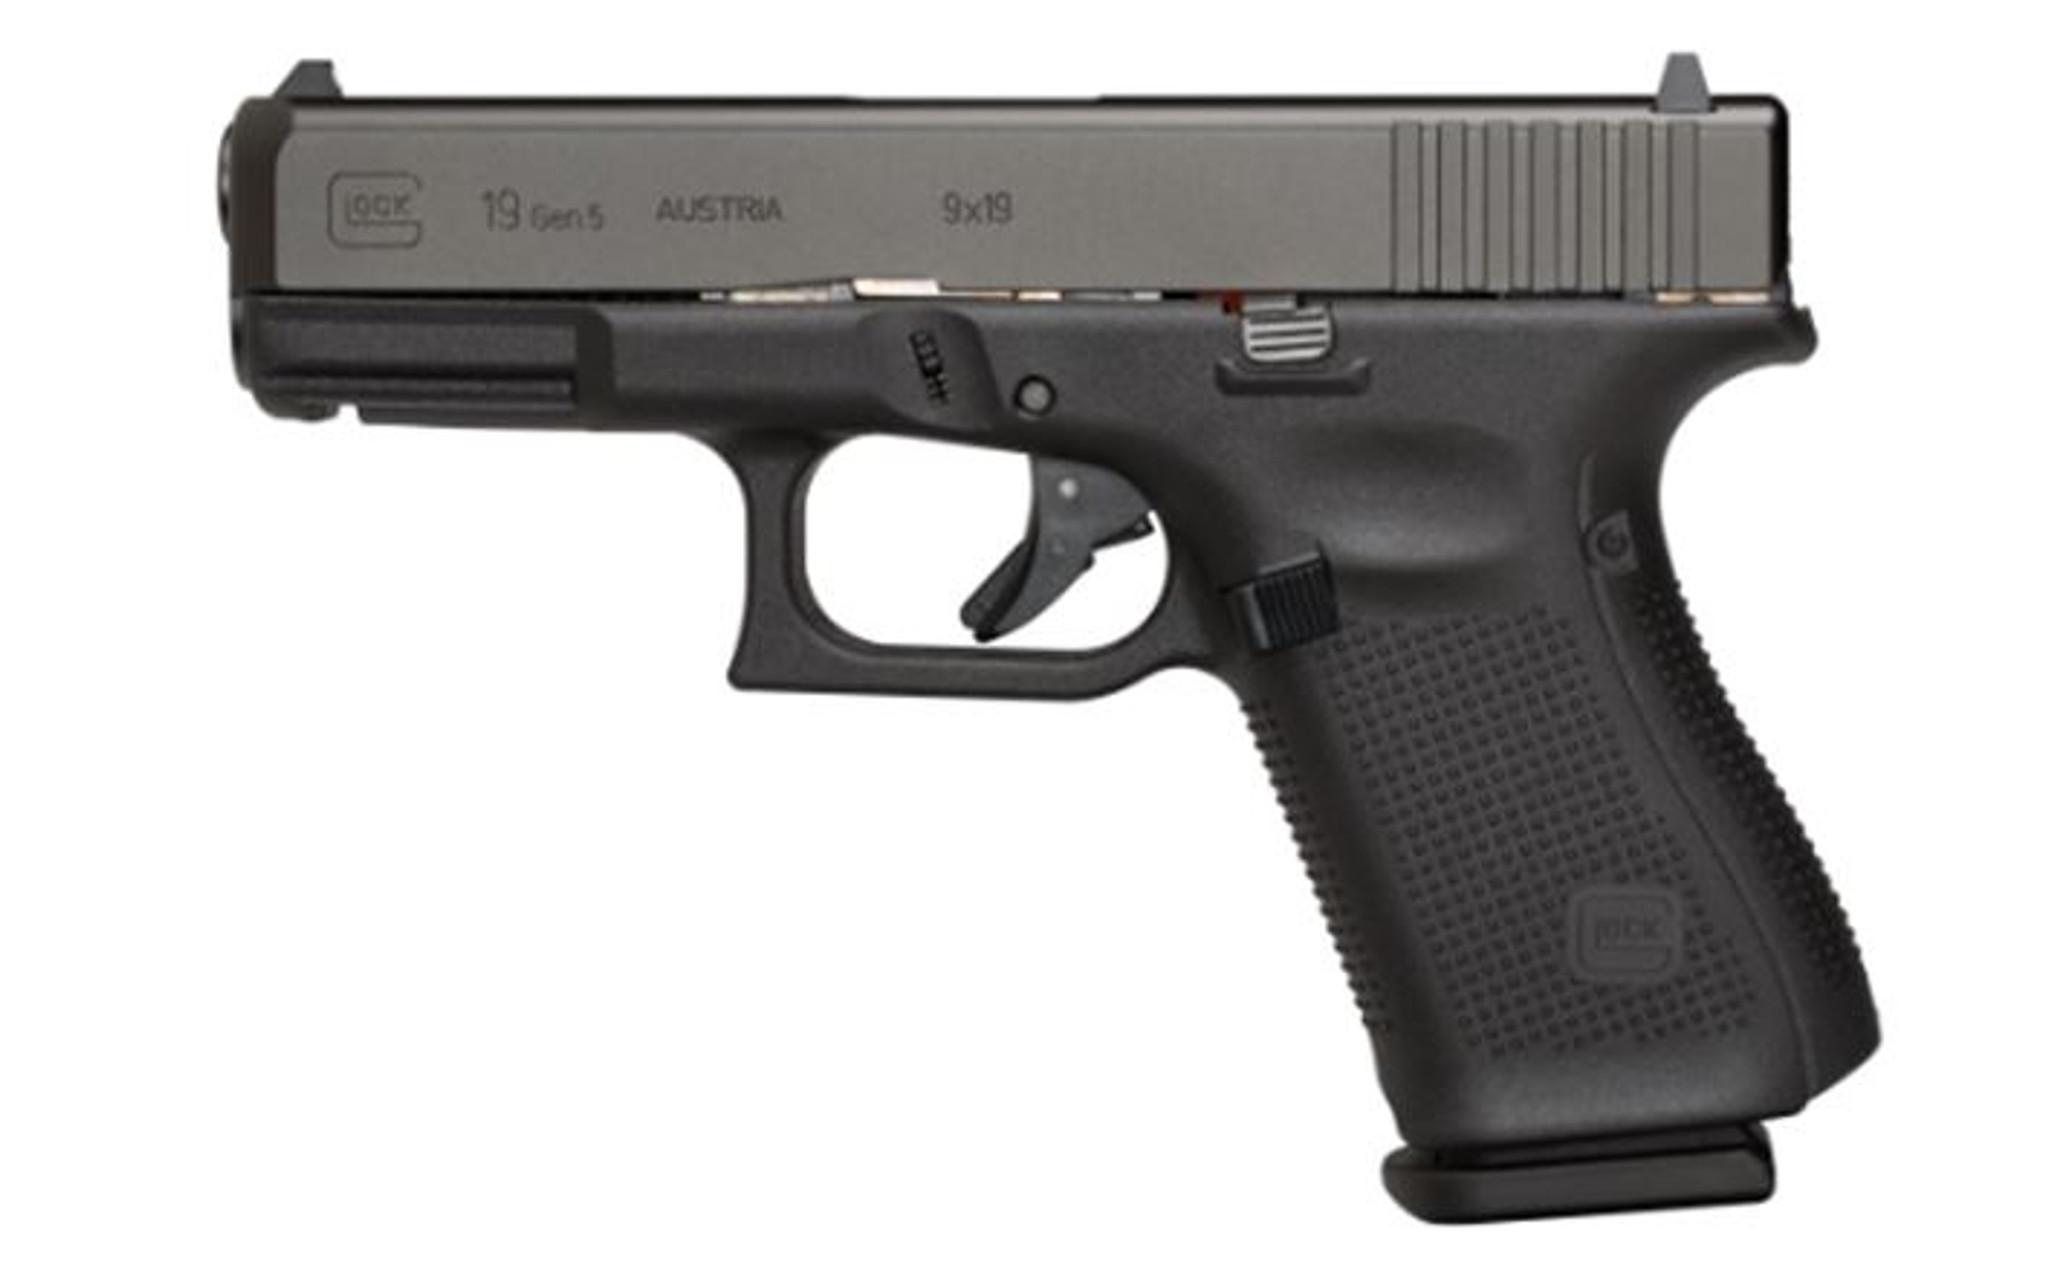 Glock 19 gen 5 Holsters